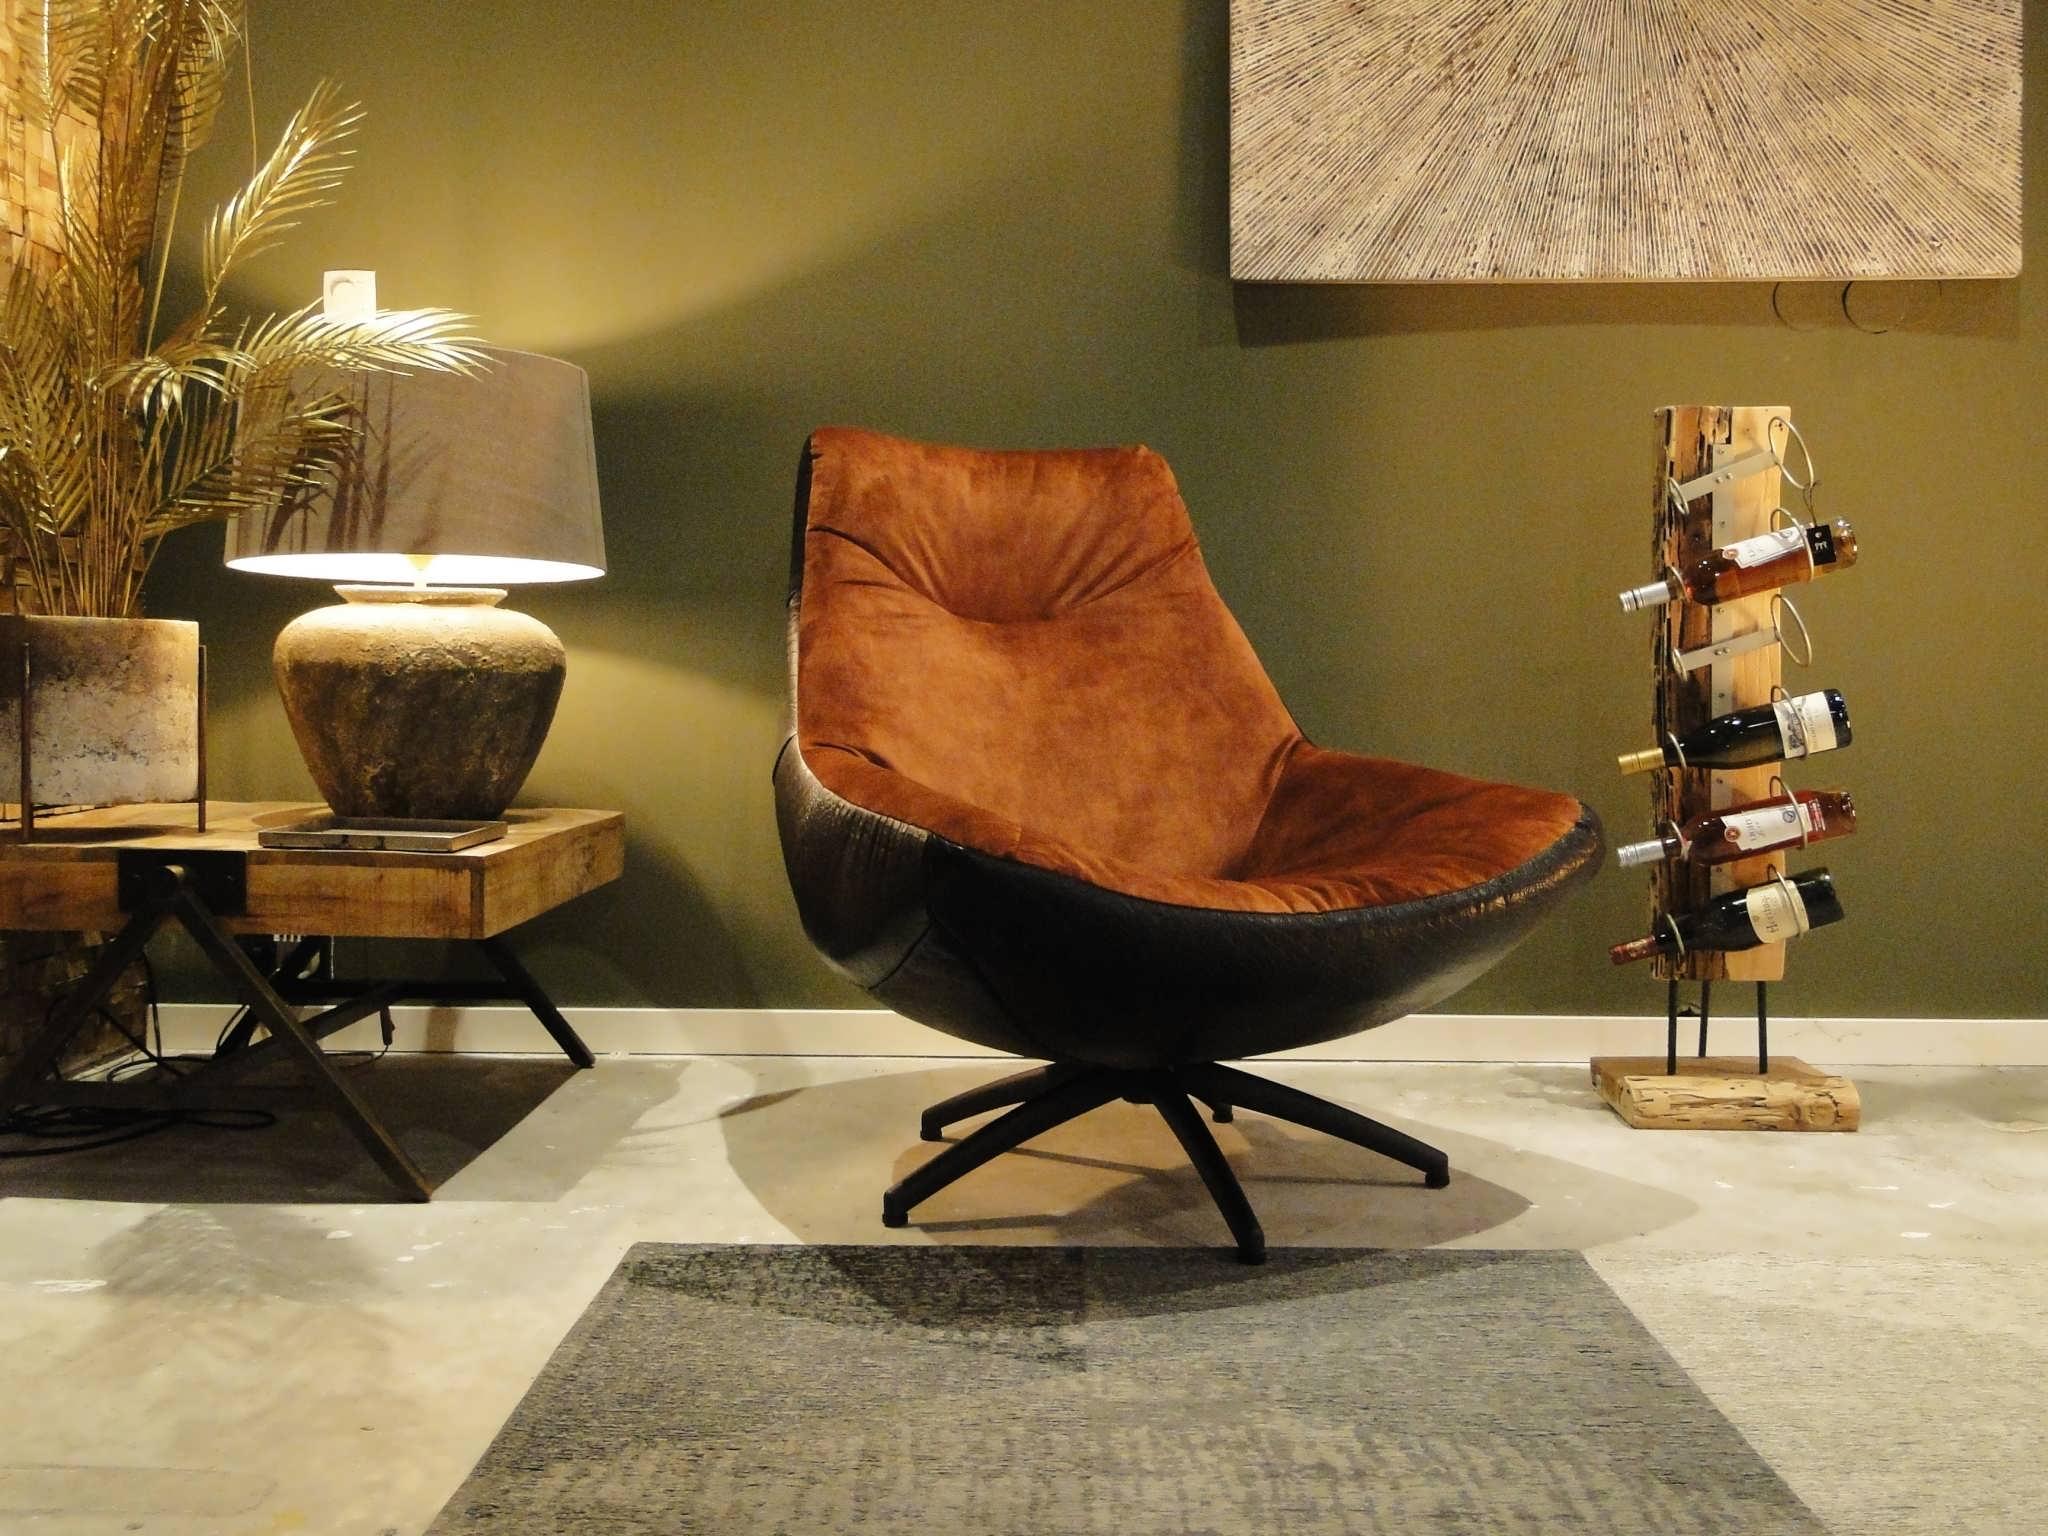 Robuuste relax stoel